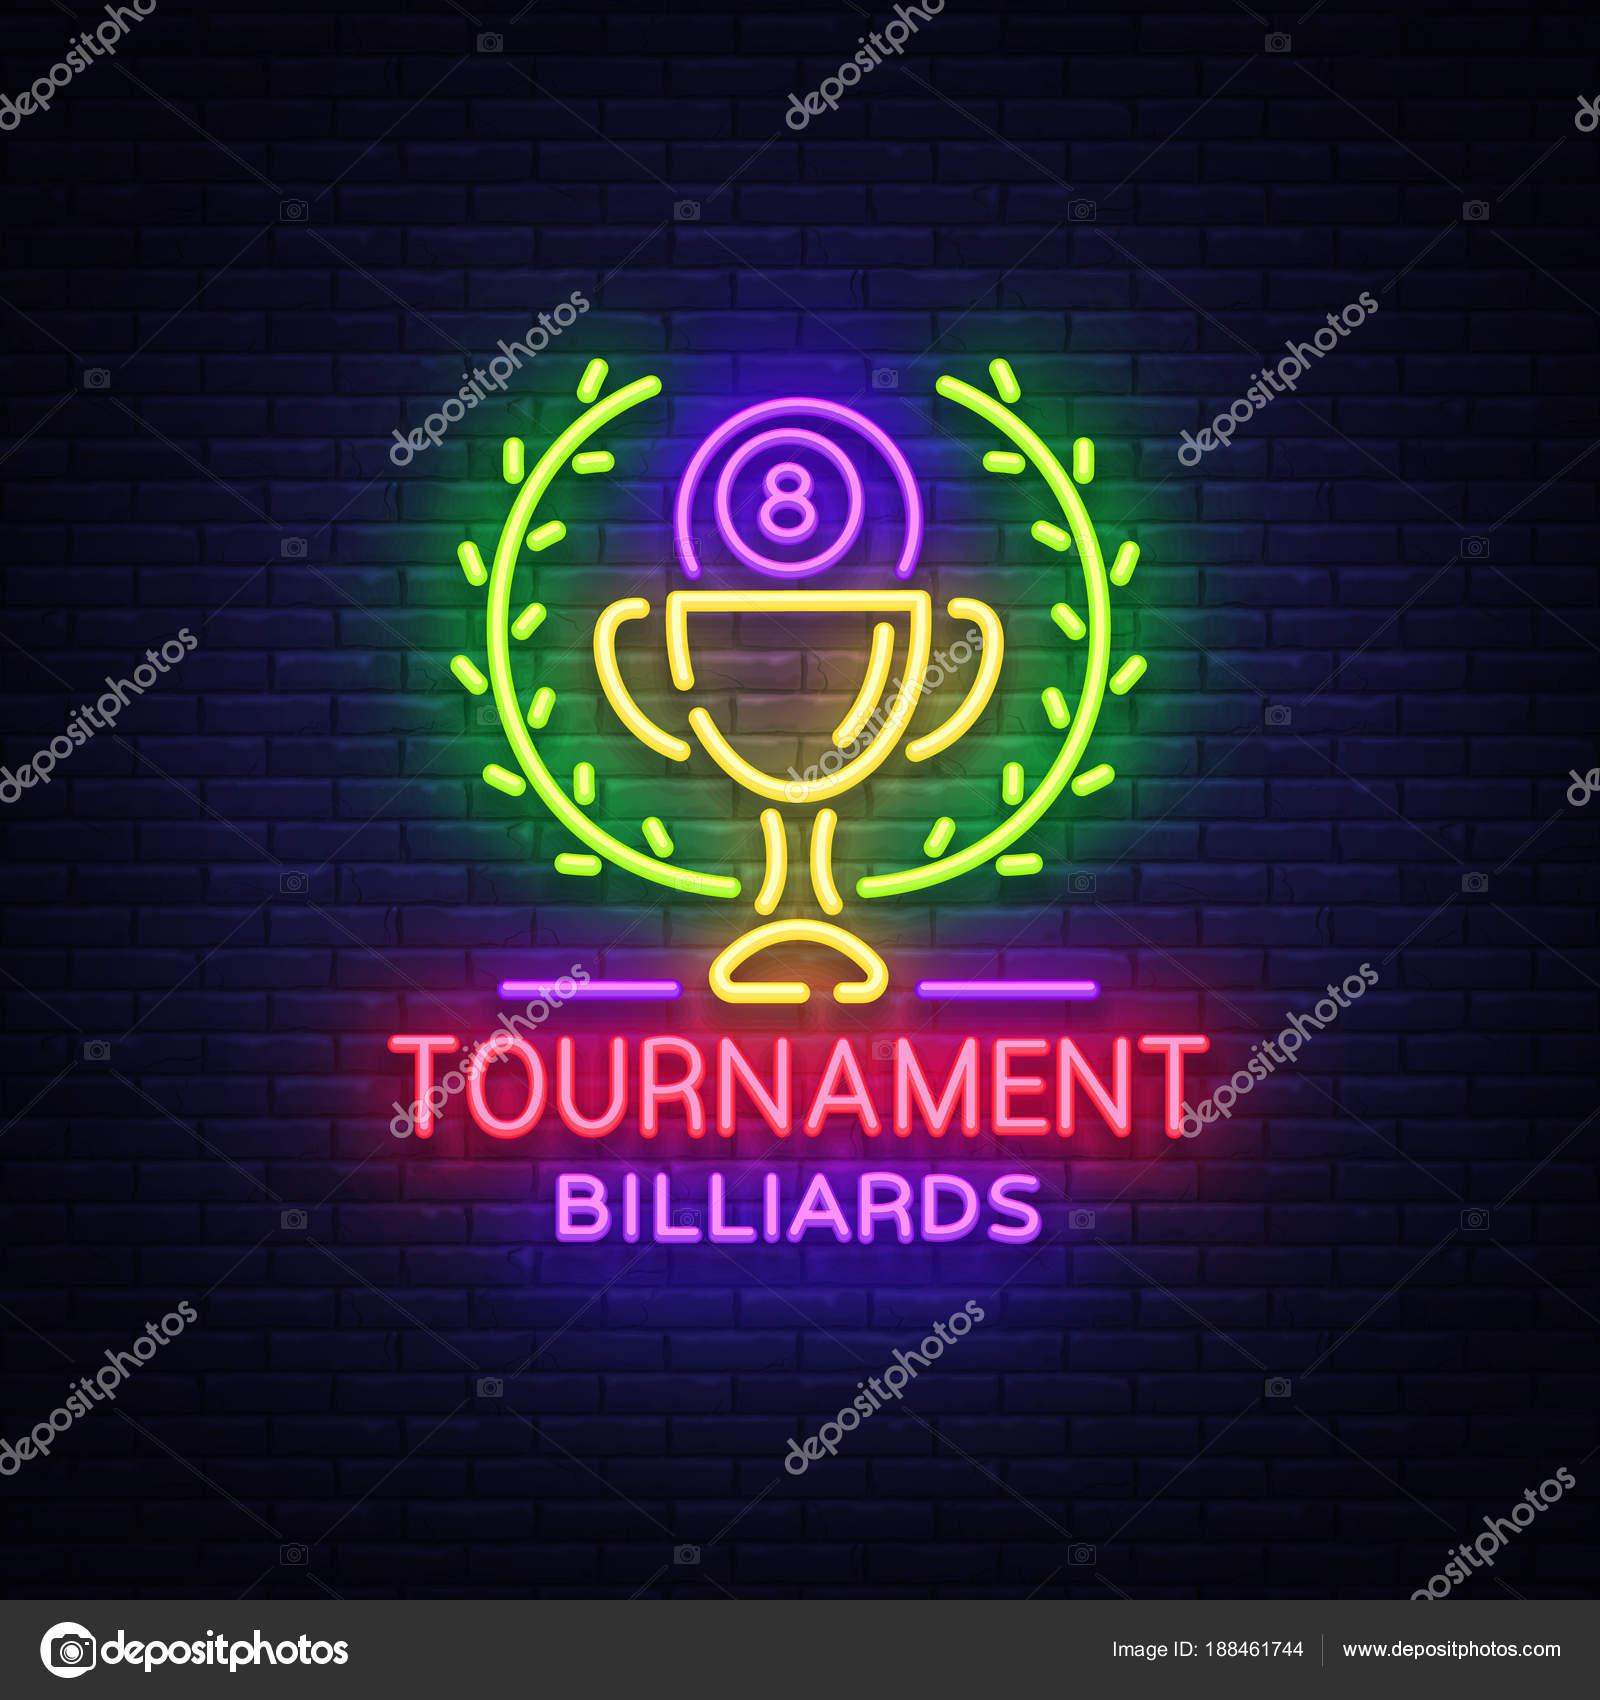 Billiards tournament logo in neon style neon sign design template billiards tournament logo in neon style neon sign design template for billiard club bar light banner night neon advertising design element buycottarizona Choice Image